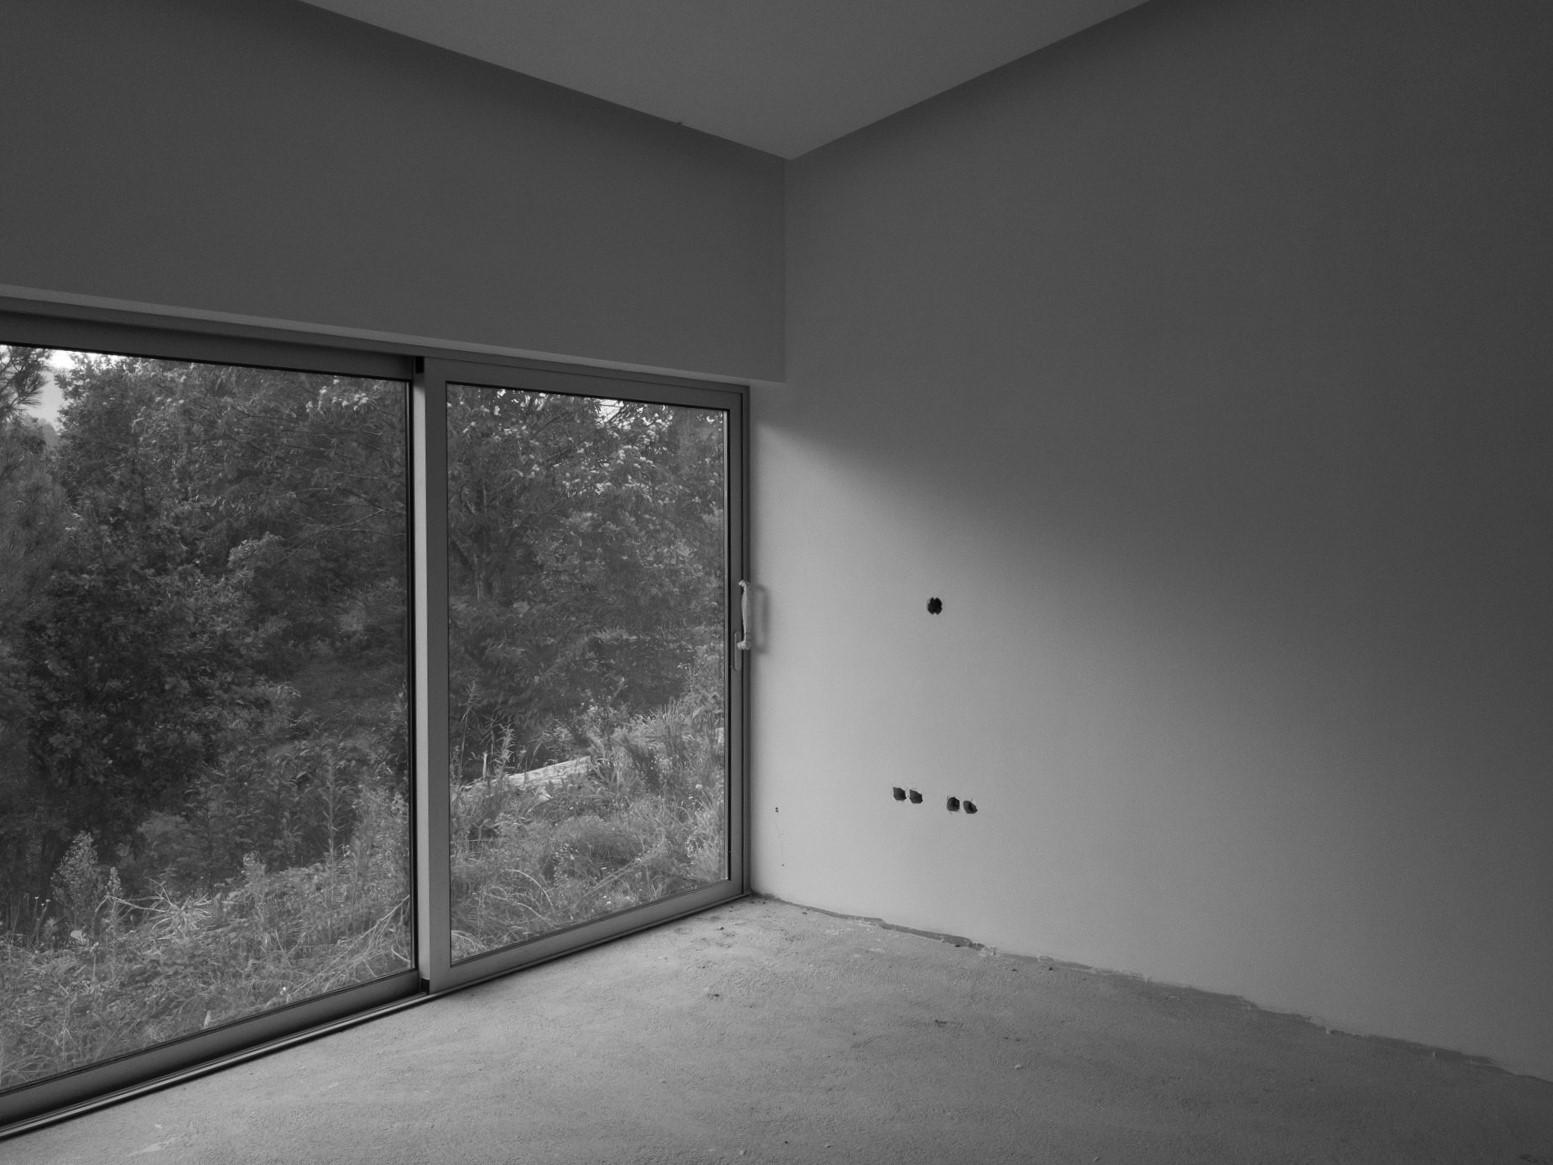 Moradia S+N - arquitectura - EVA evolutionary architecture - arquitectos porto - oliveira de azemeis (17).jpg